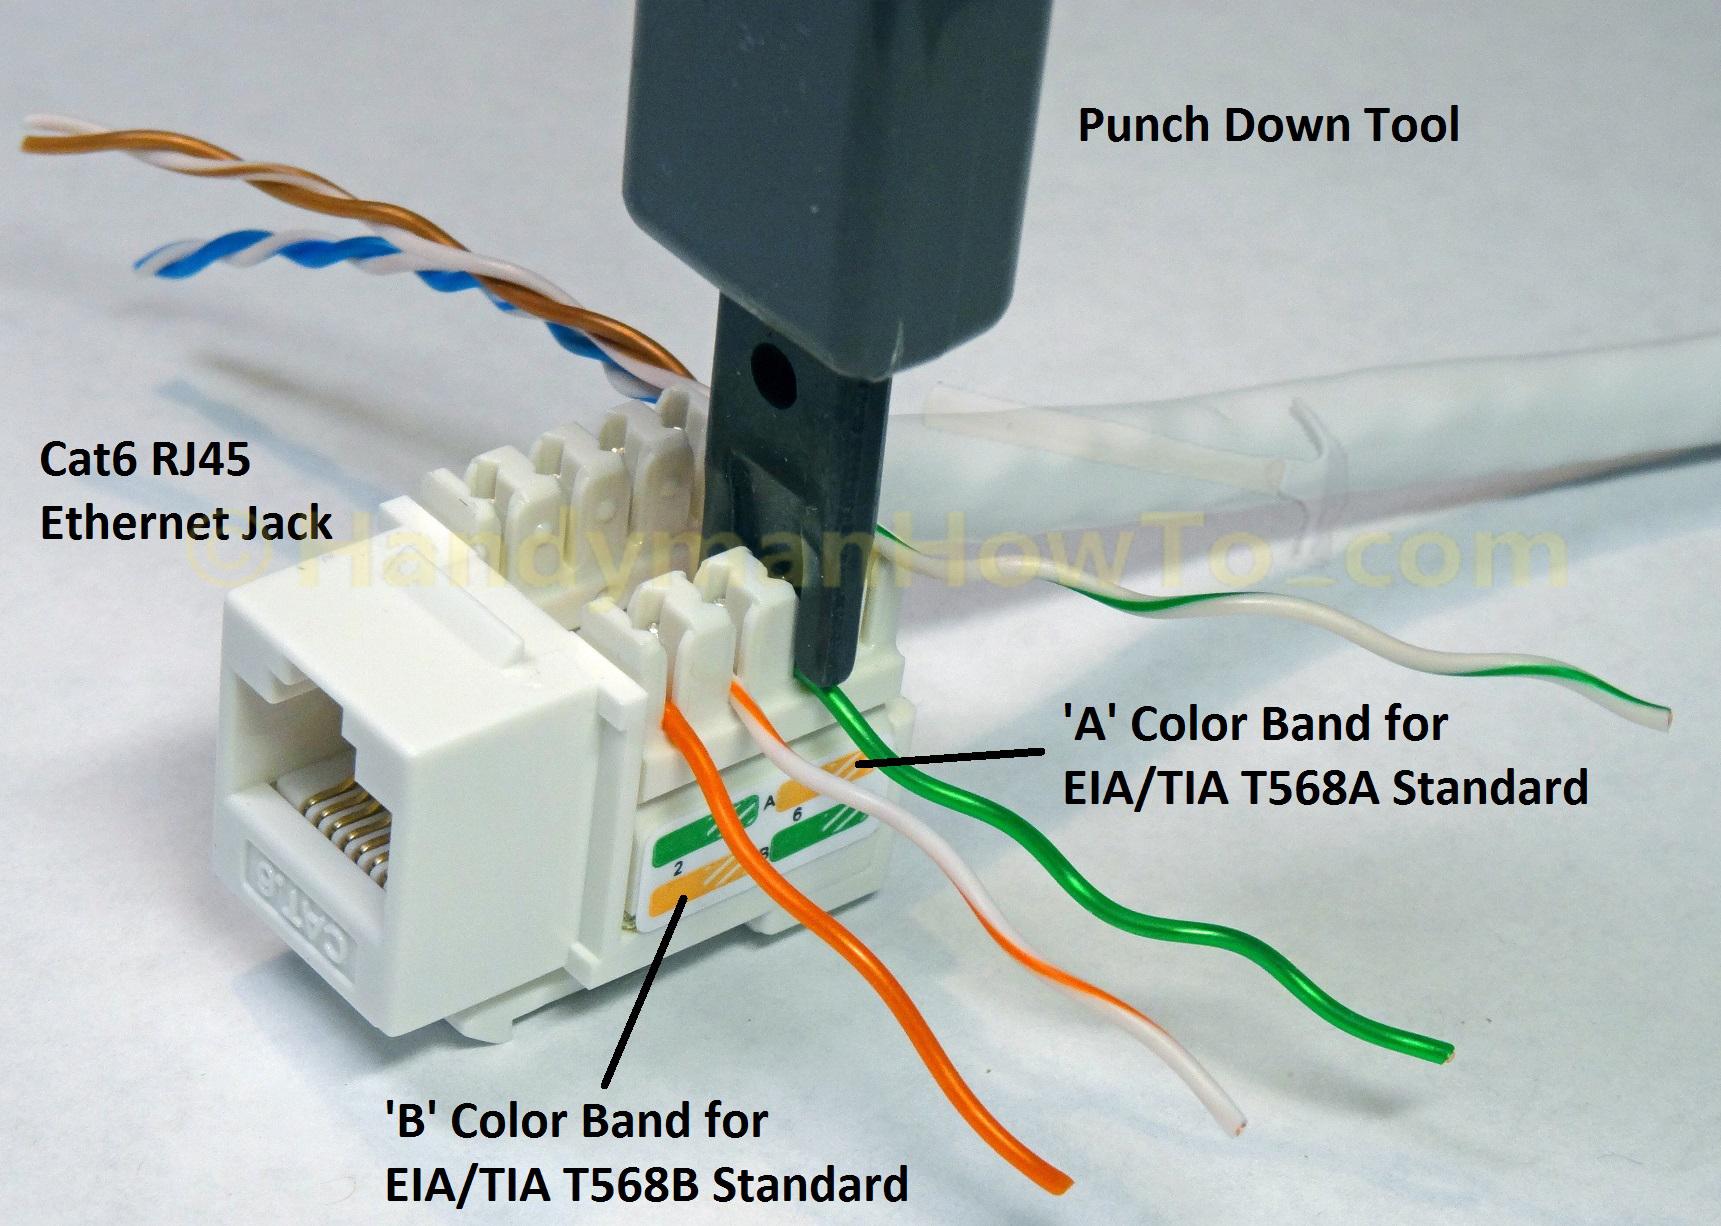 cat 5 wall plate wiring diagram lk 9538  plate wiring diagram wiring diagram cat5e patch cable  lk 9538  plate wiring diagram wiring